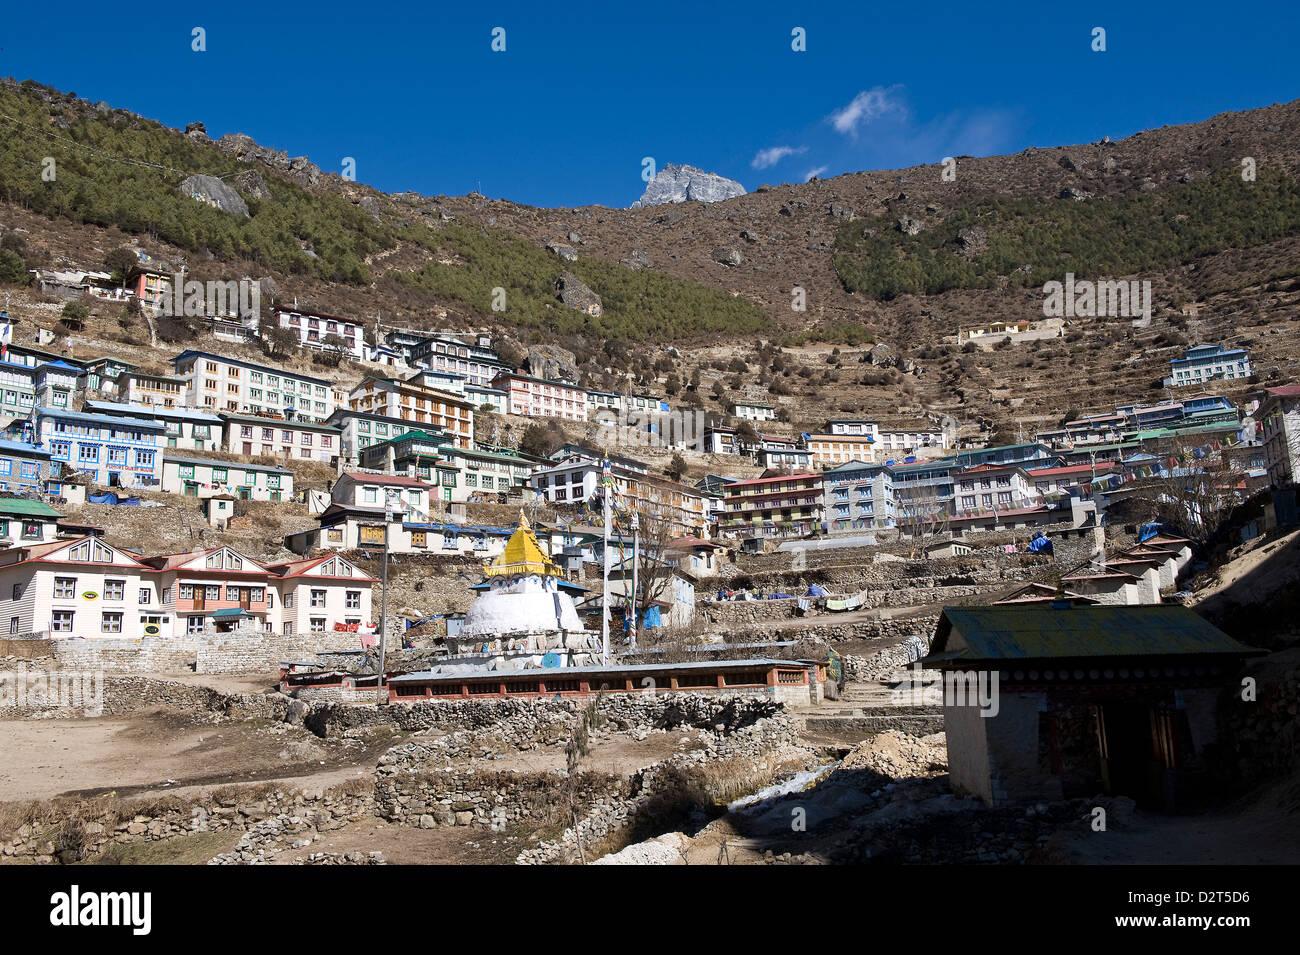 Namche Bazaar, Solu Khumbu Region, Nepal, Himalayas, Asia - Stock Image